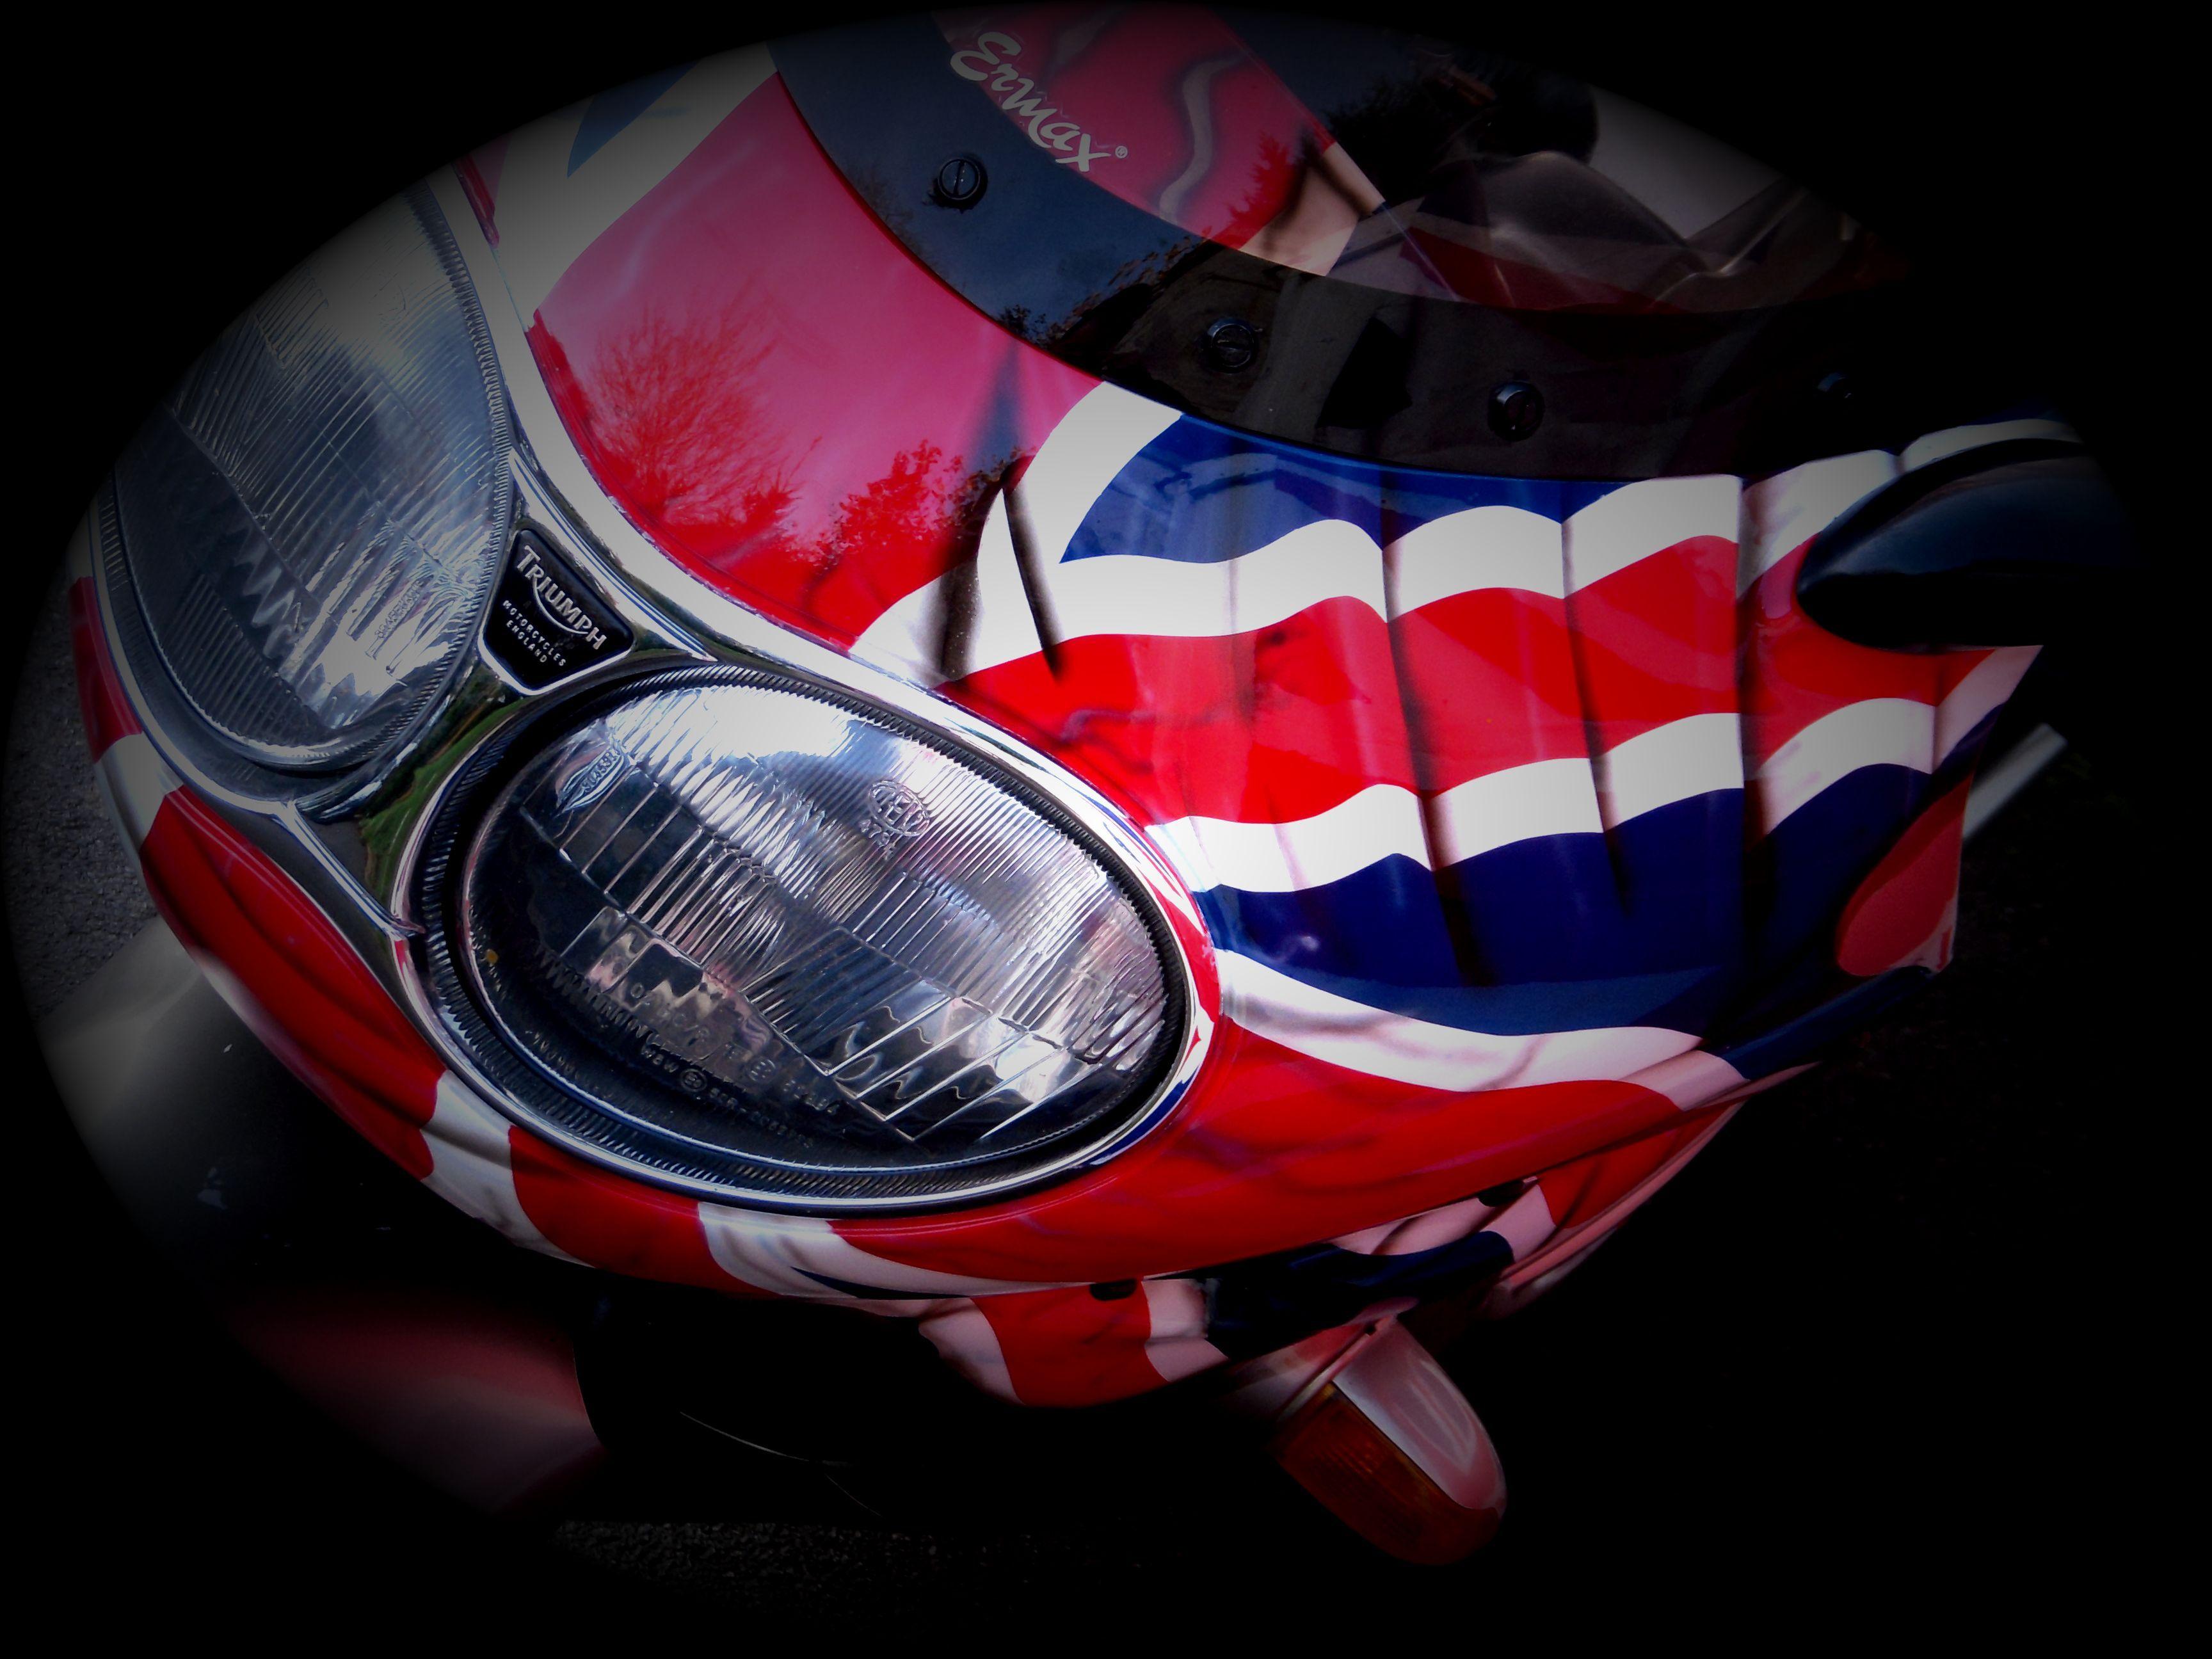 13 best Union Jack images on Pinterest | Union jack, Flags and England